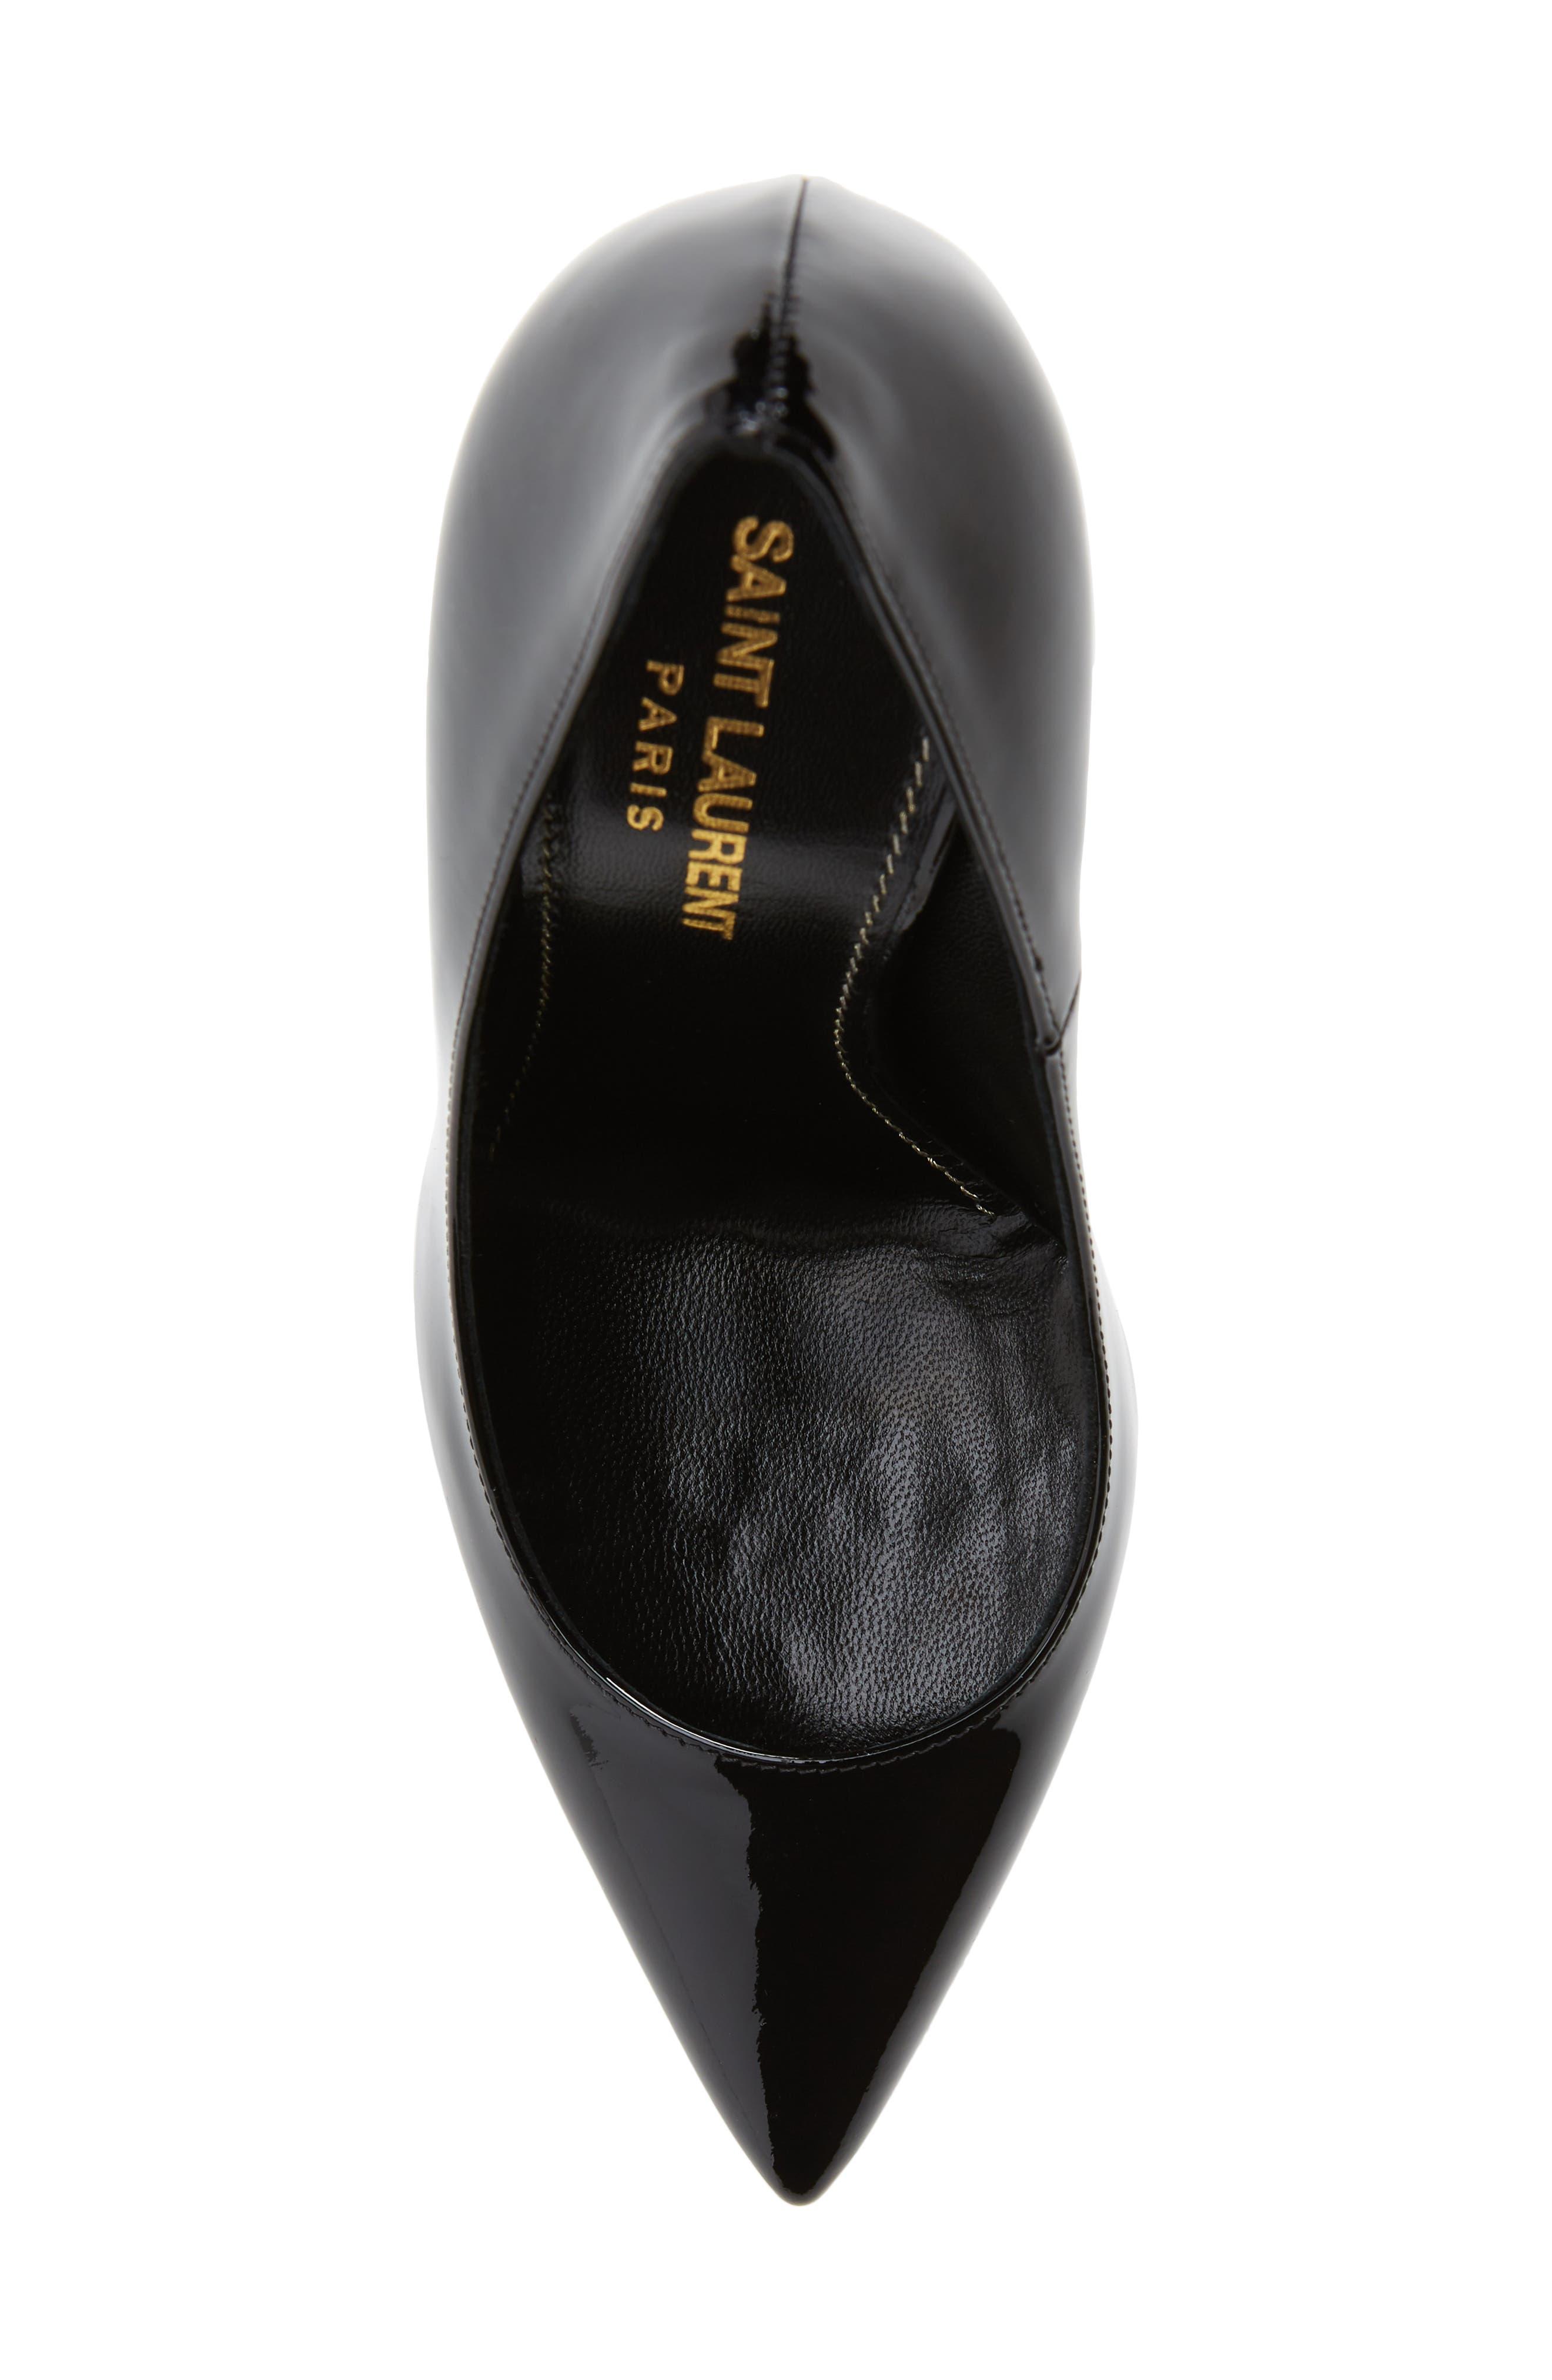 Opyum YSL Pointy Toe Pump,                             Alternate thumbnail 3, color,                             Black/ Black